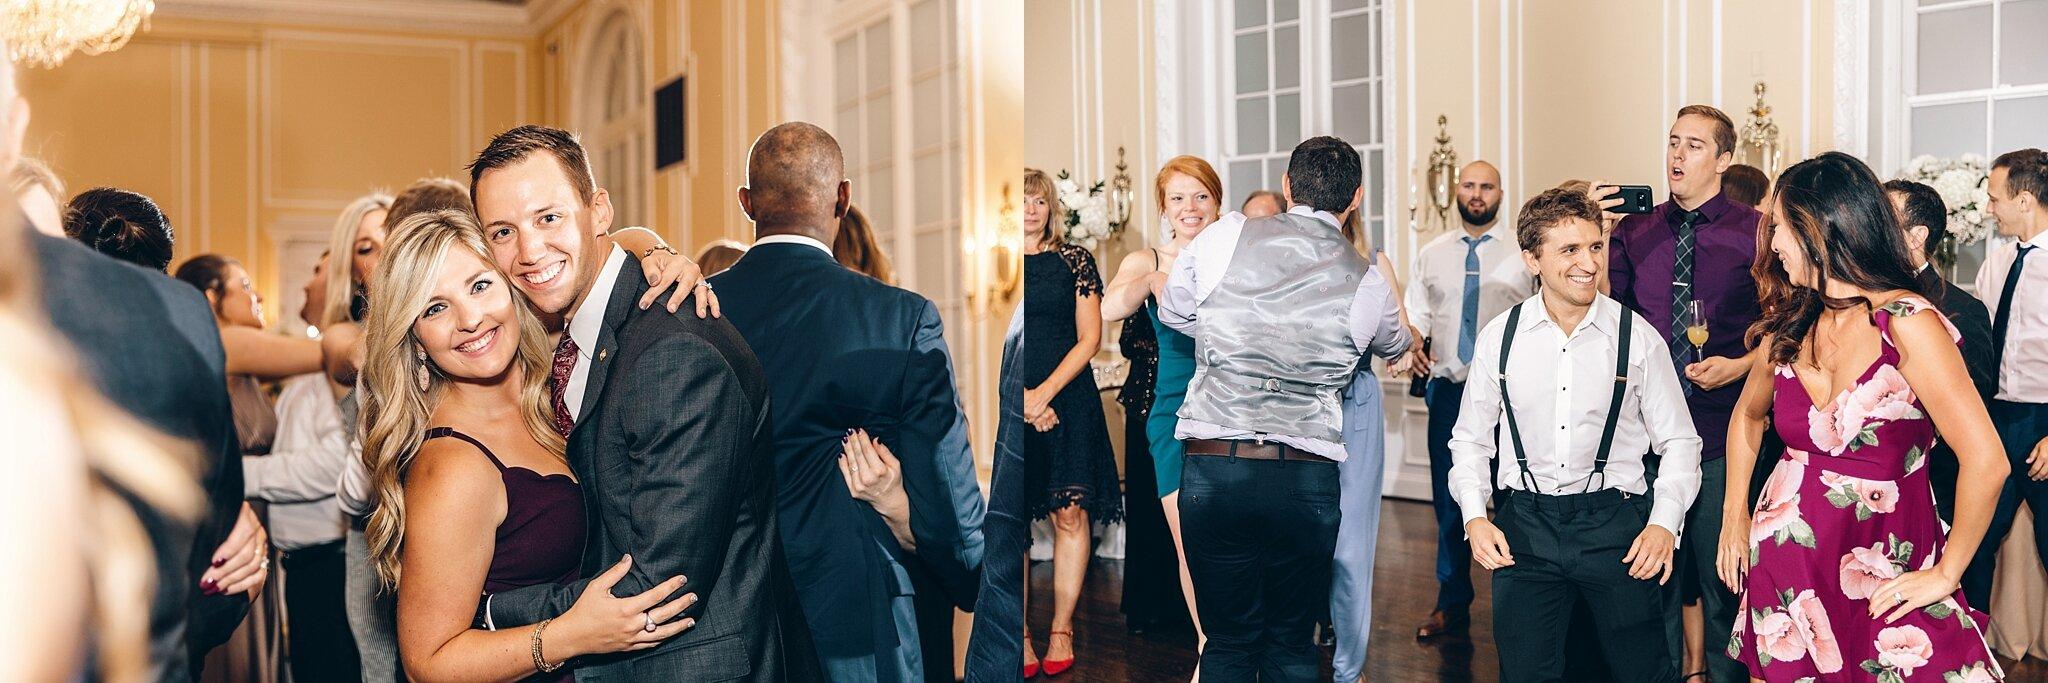 patrick-henry-ballroom-wedding-roanoke_0560.jpg